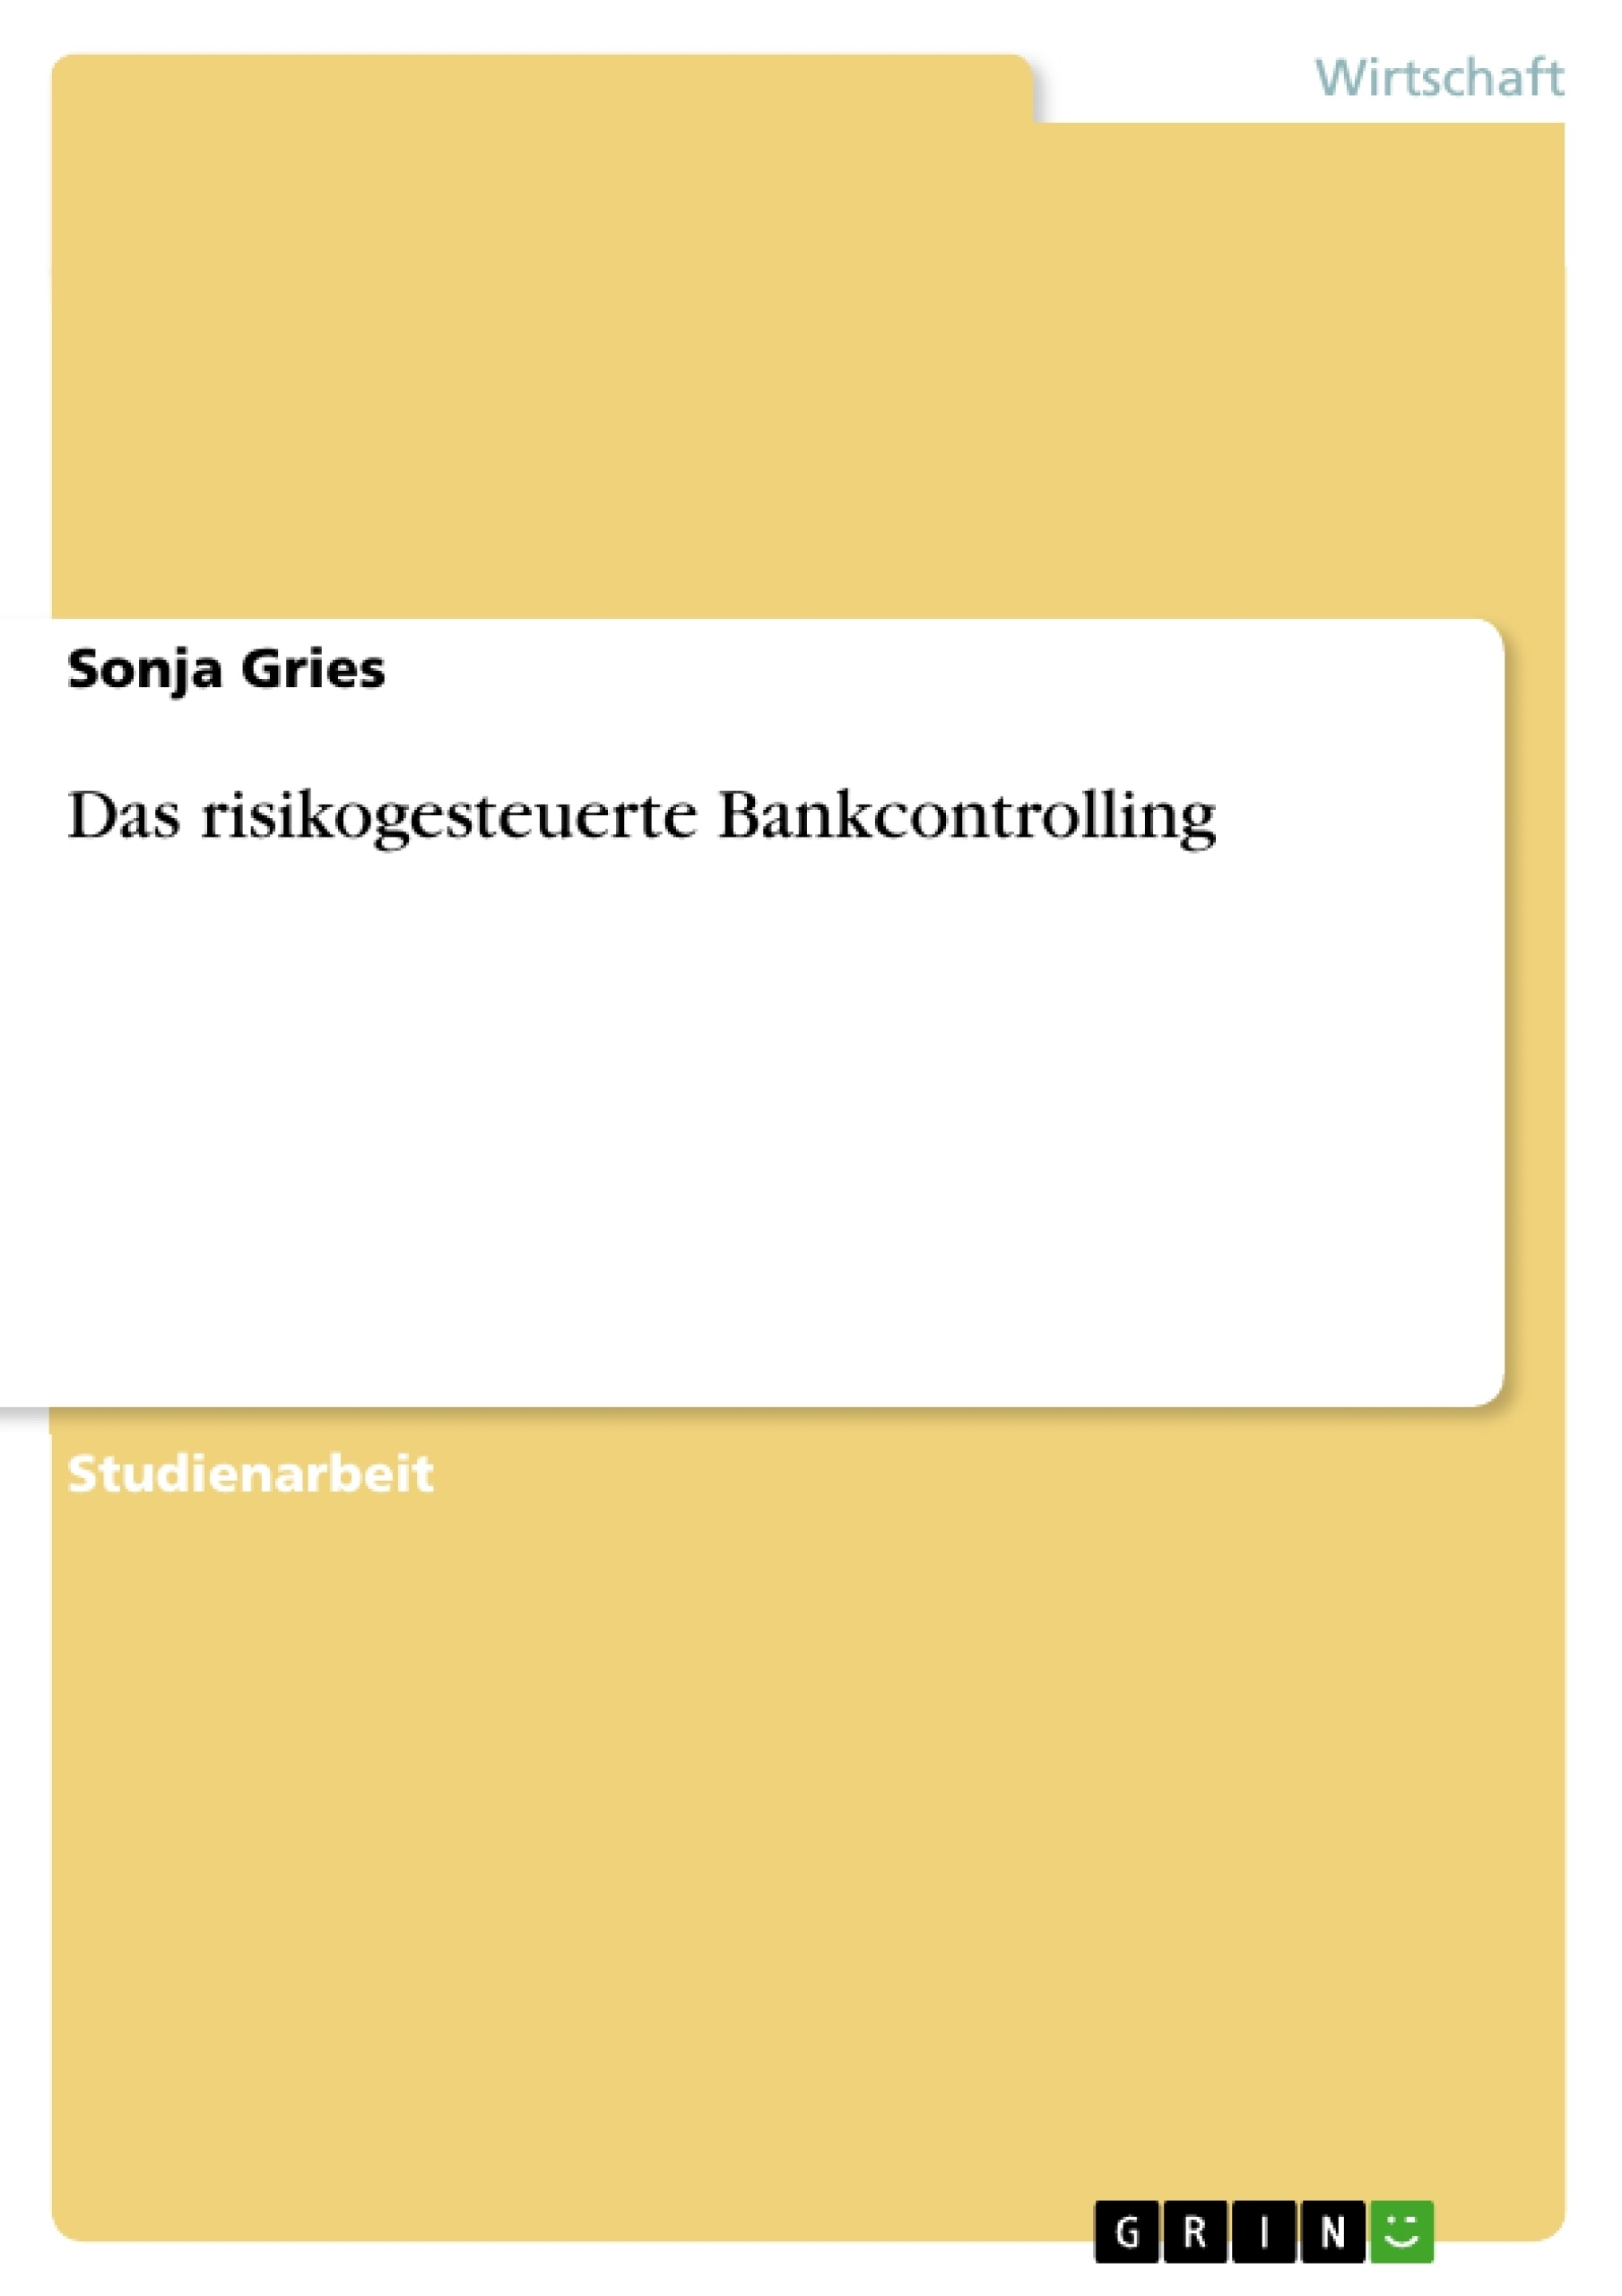 Titel: Das risikogesteuerte Bankcontrolling